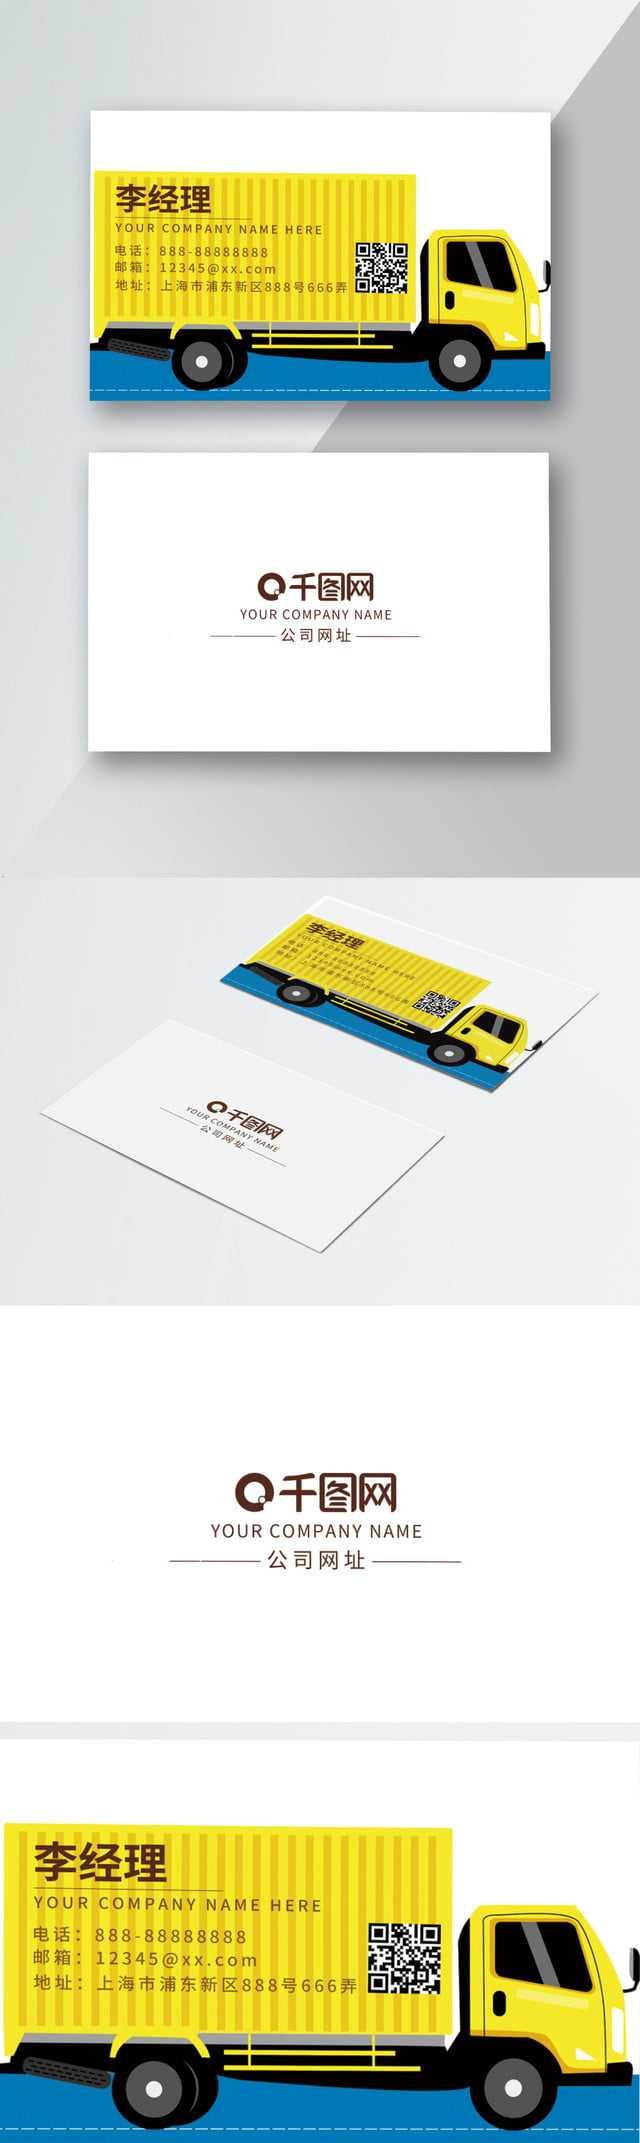 Truck Transportation Business Card Undertake Freight In Transport Business Cards Templates Free